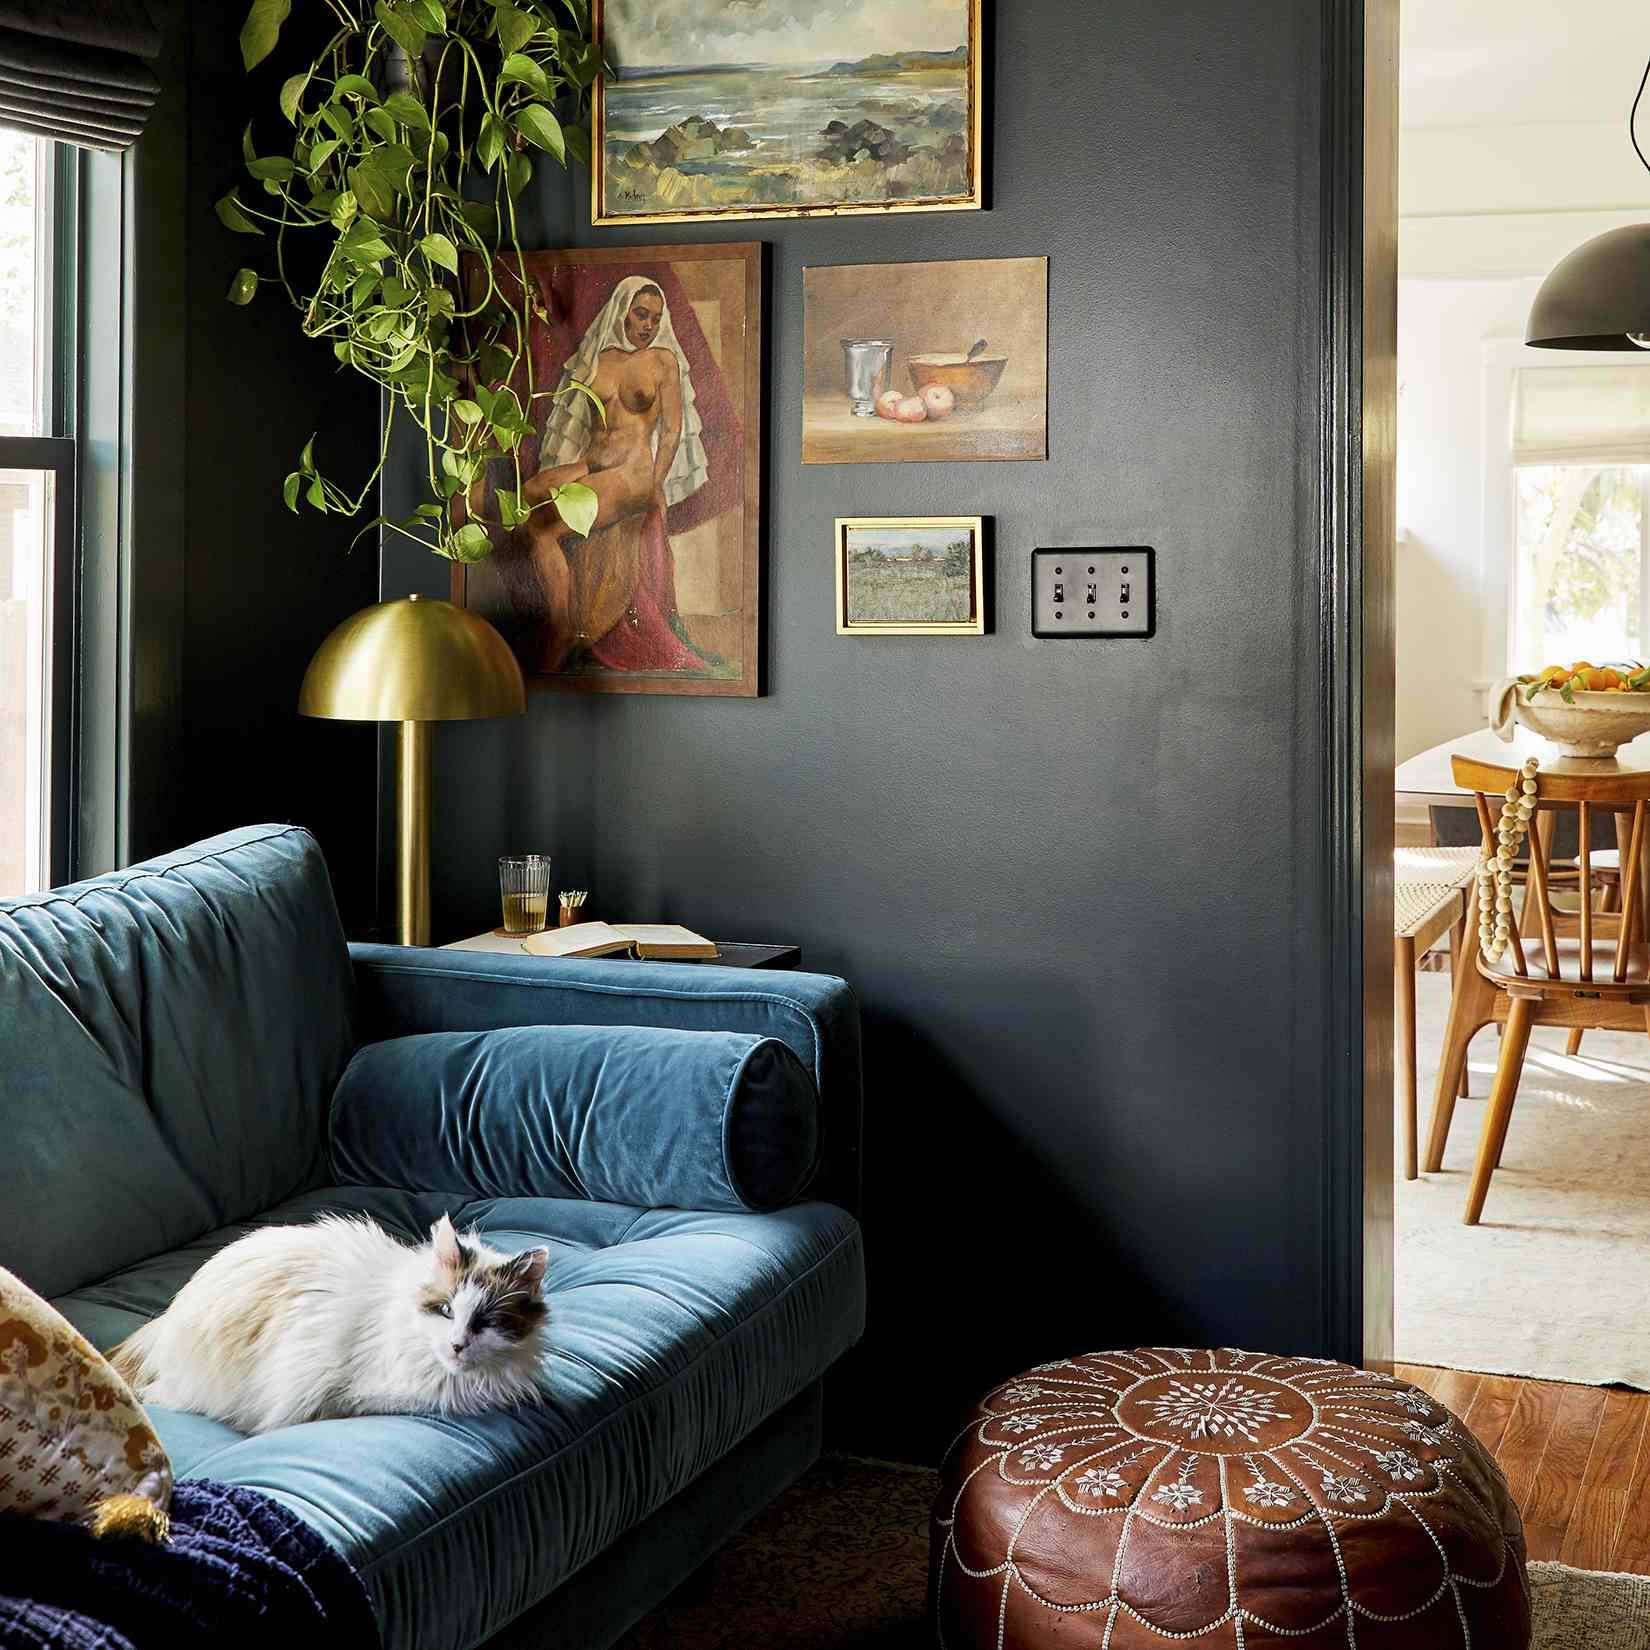 best living room ideas - dark color walls with vintage paintings